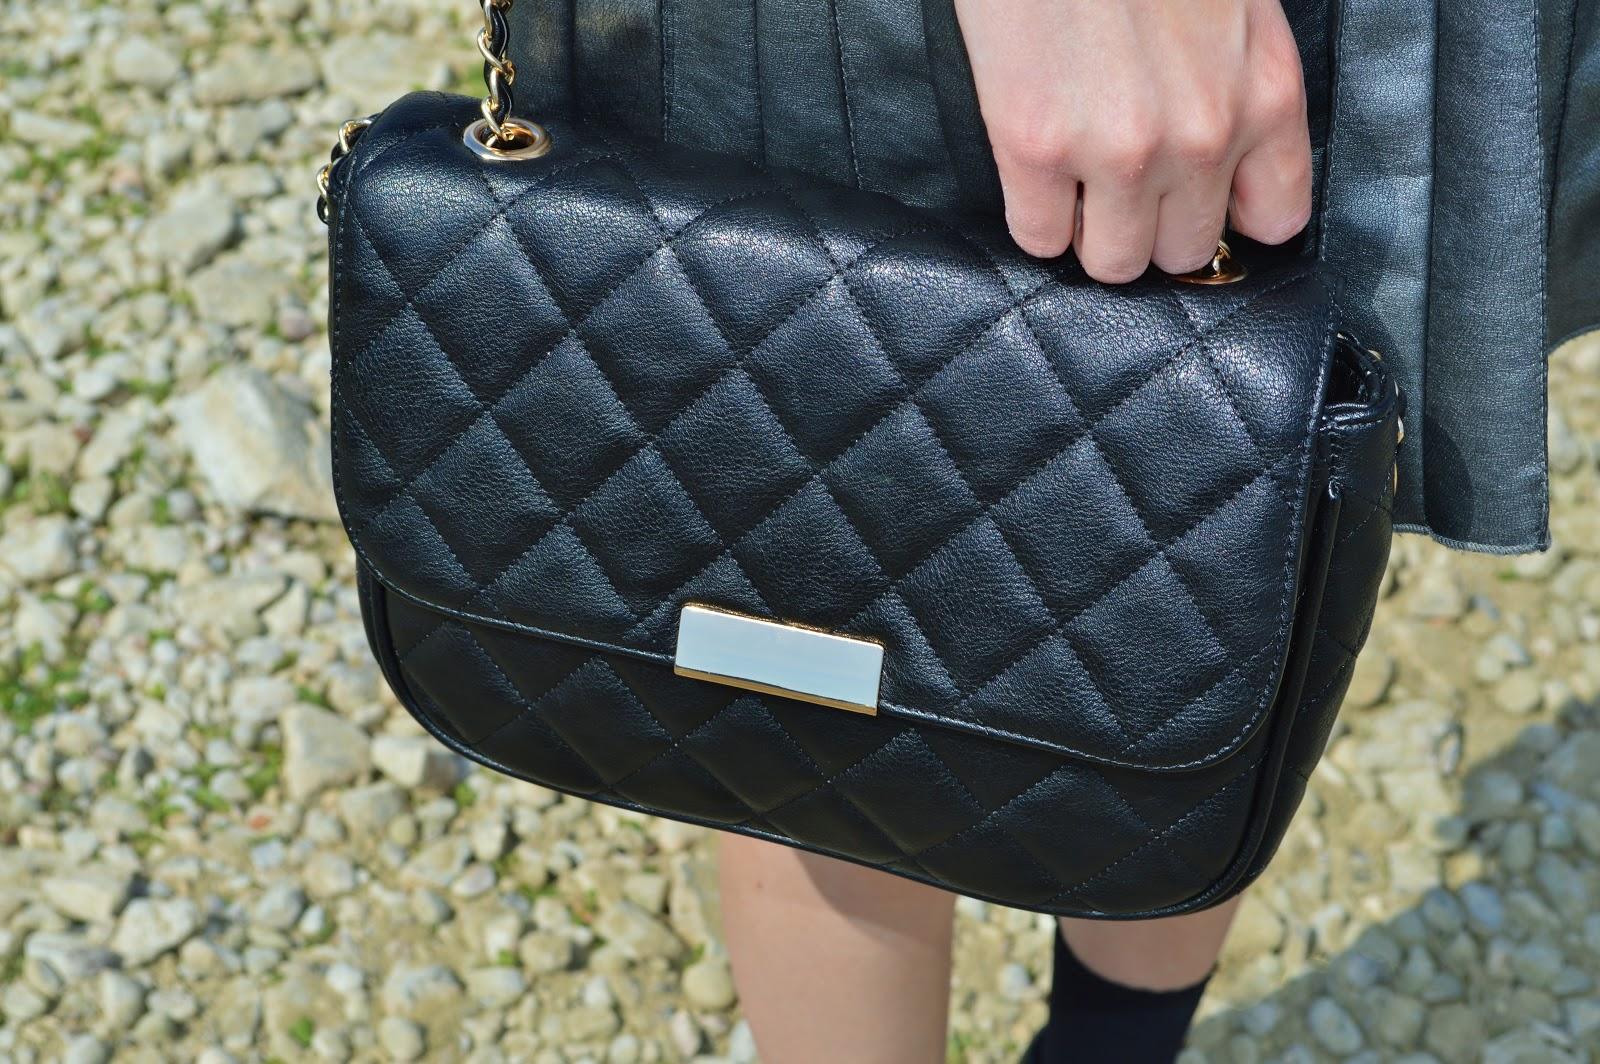 UK Fashion & Personal Style Blogger